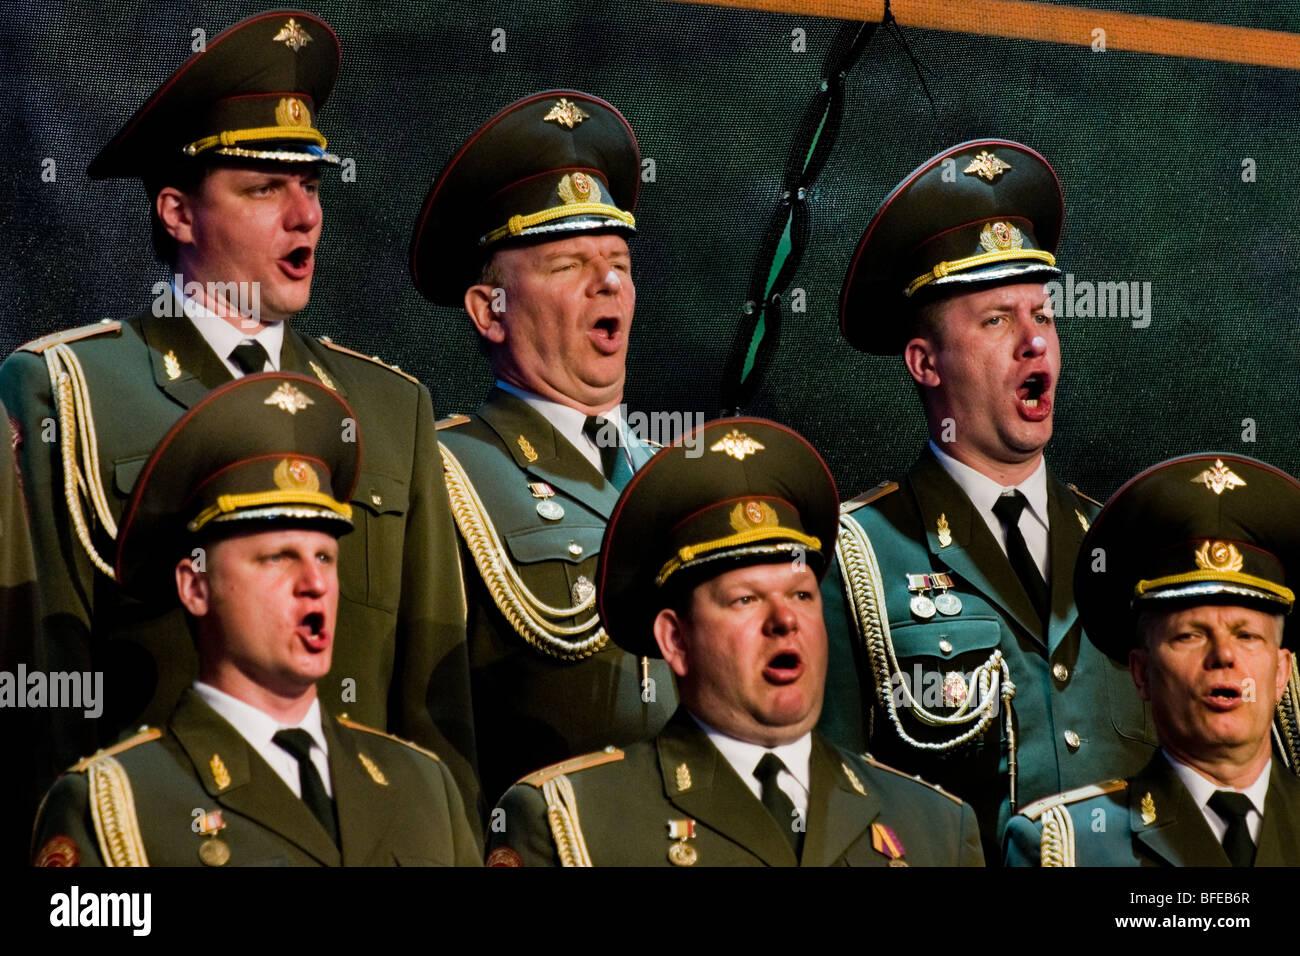 Alexandrov Ensemble, the Russian Red Army Choir performs